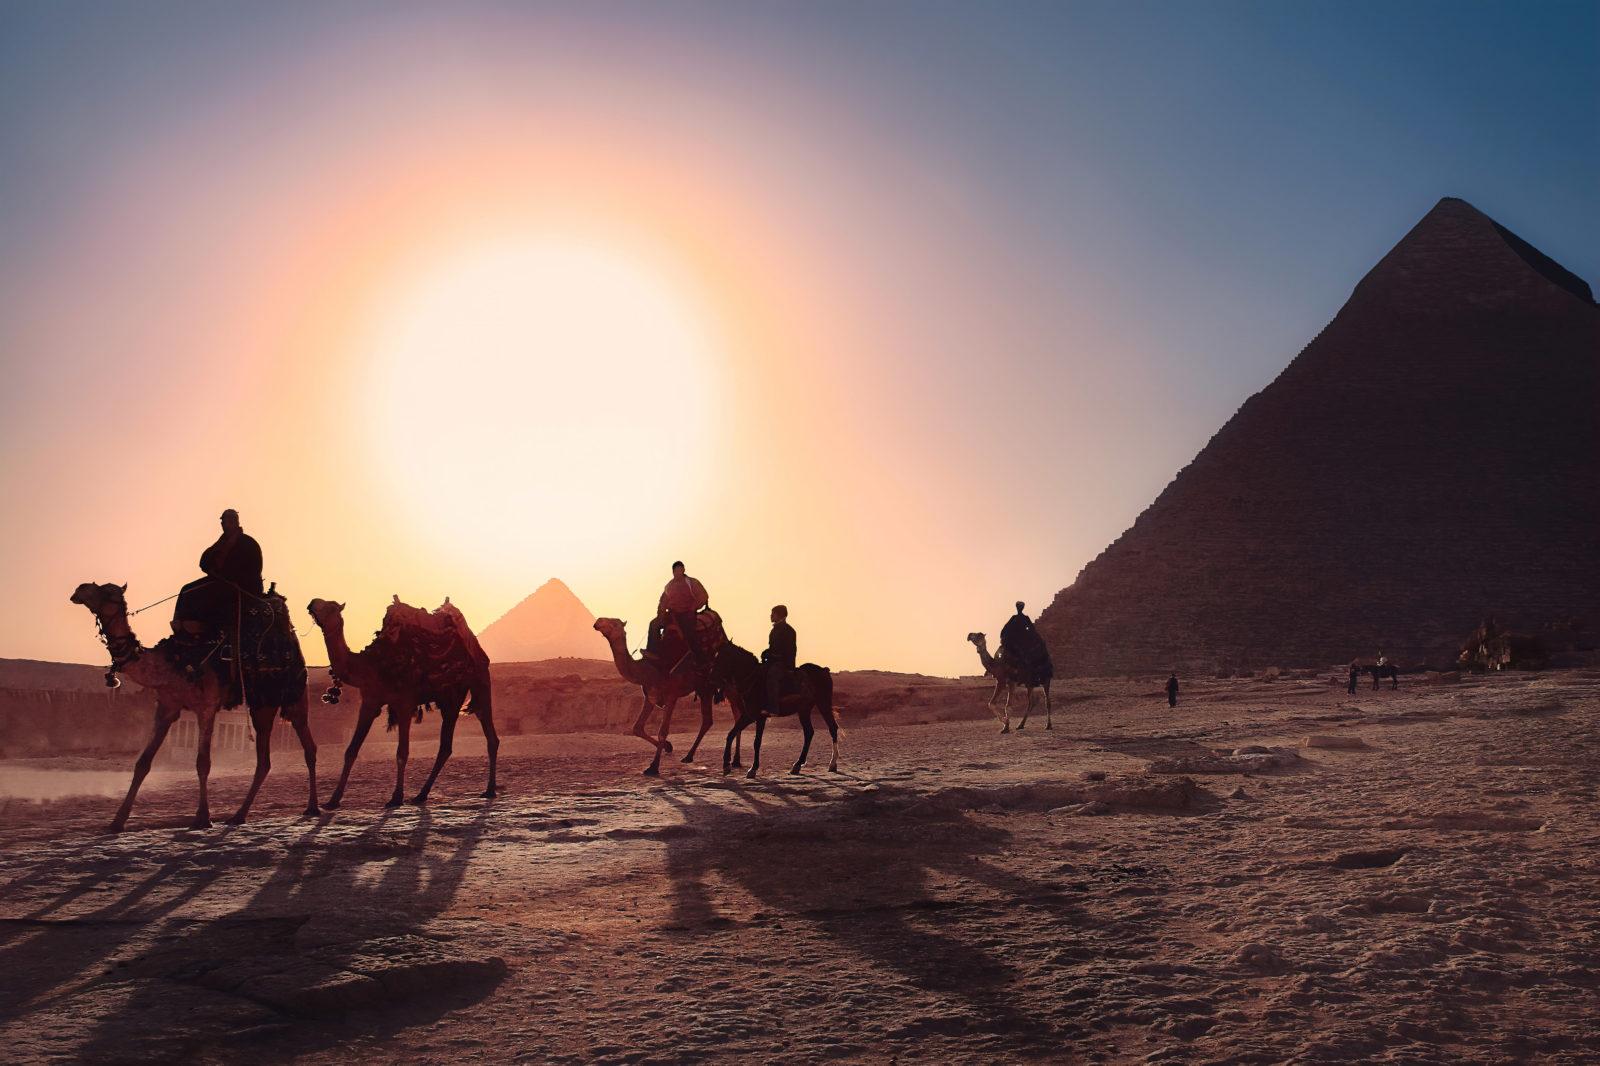 Sahara, Egypt, poušť, velbloudi